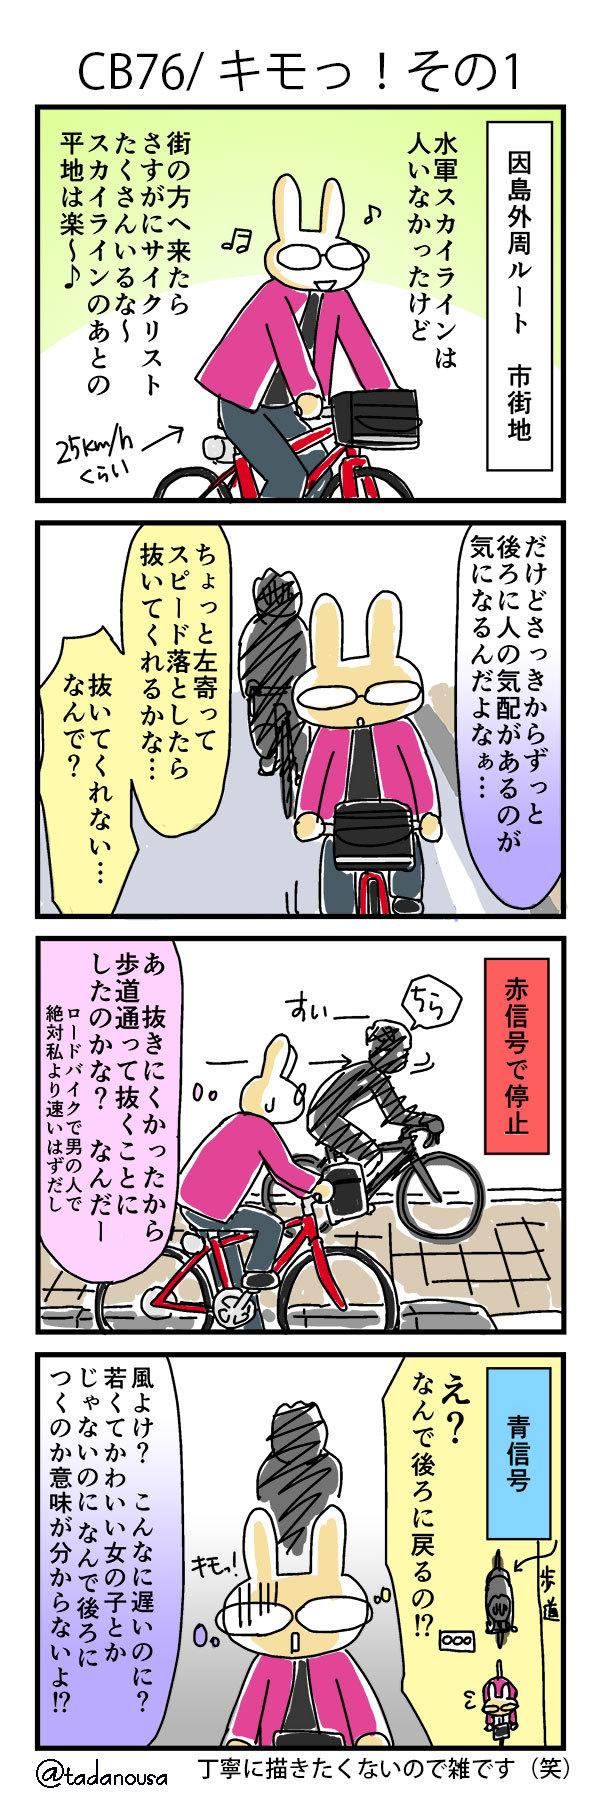 bike_4koma_kako116_s_2.jpg